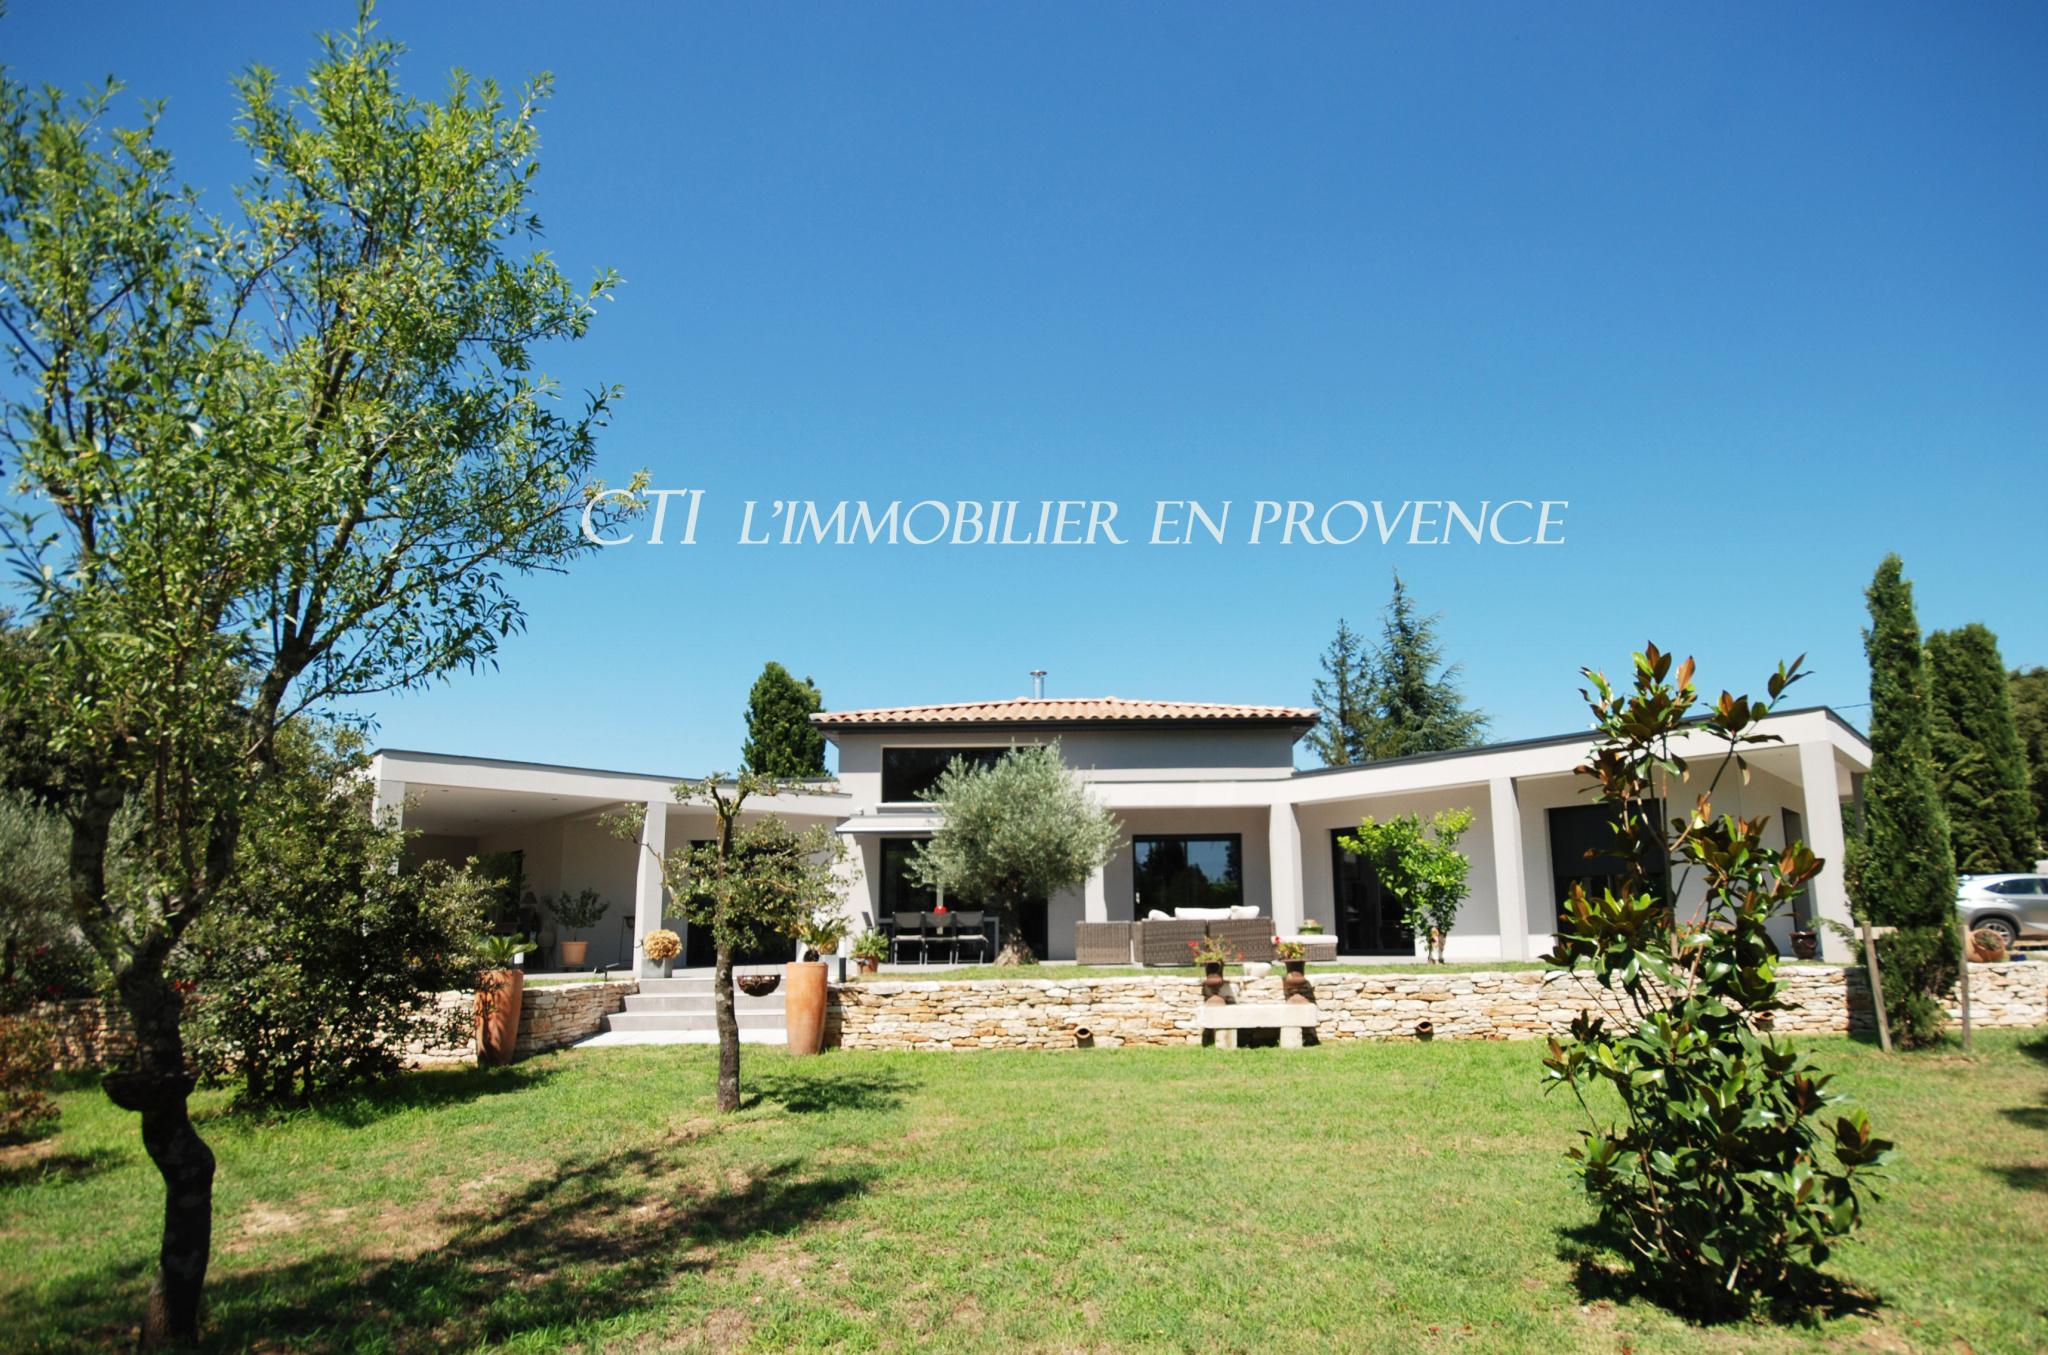 0 www.cti-provence.net A VENDRE MAISON ARCHITECTE NEUVE RT 2012 GRANDS VOLUMES PLEIN SUD JARDIN